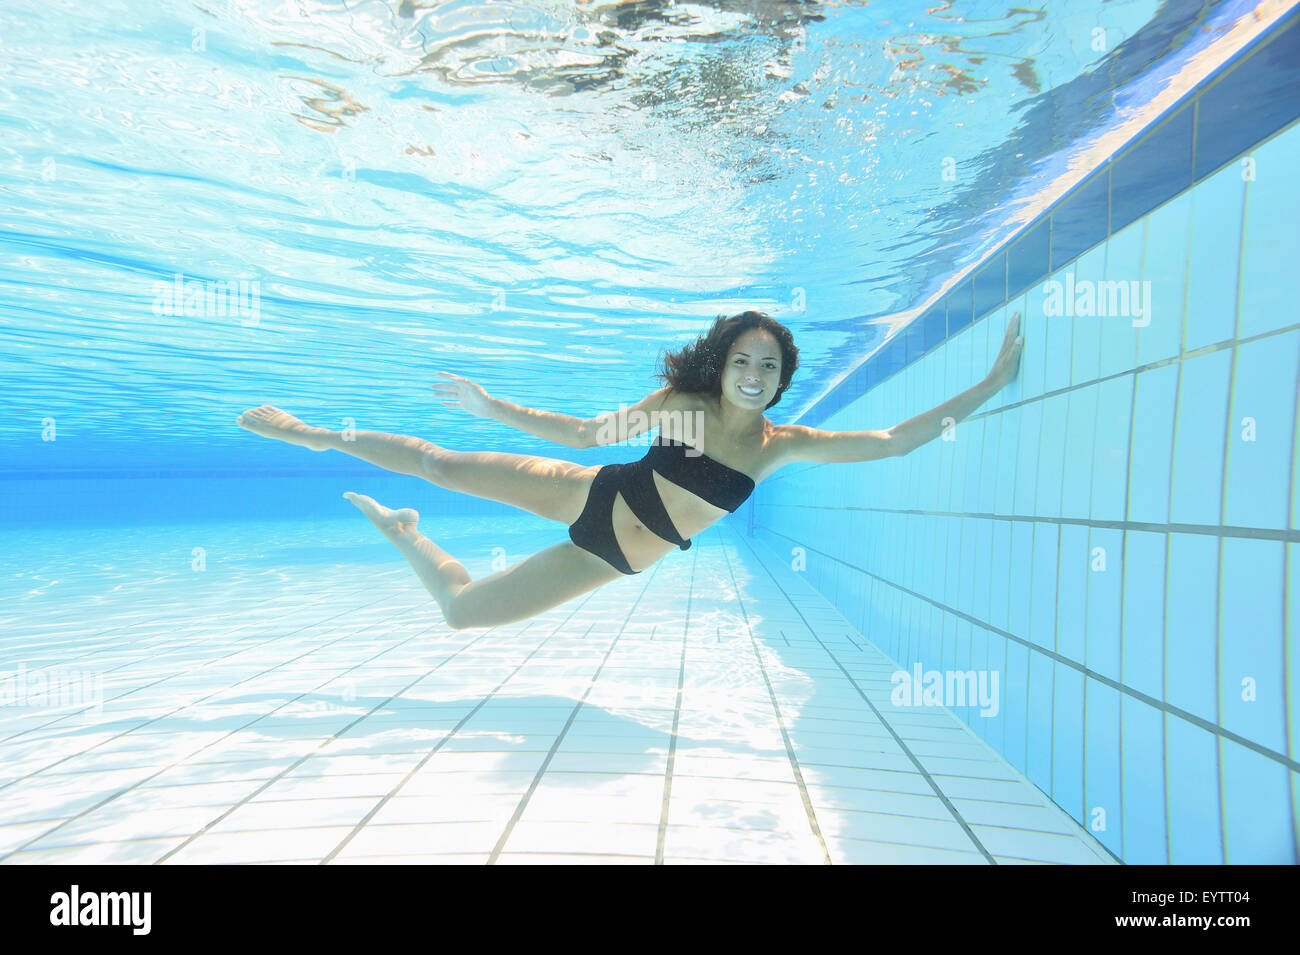 Woman, Young, Monokini, Outdoor Swimming Pool, Underwater, Swim, Look Camera